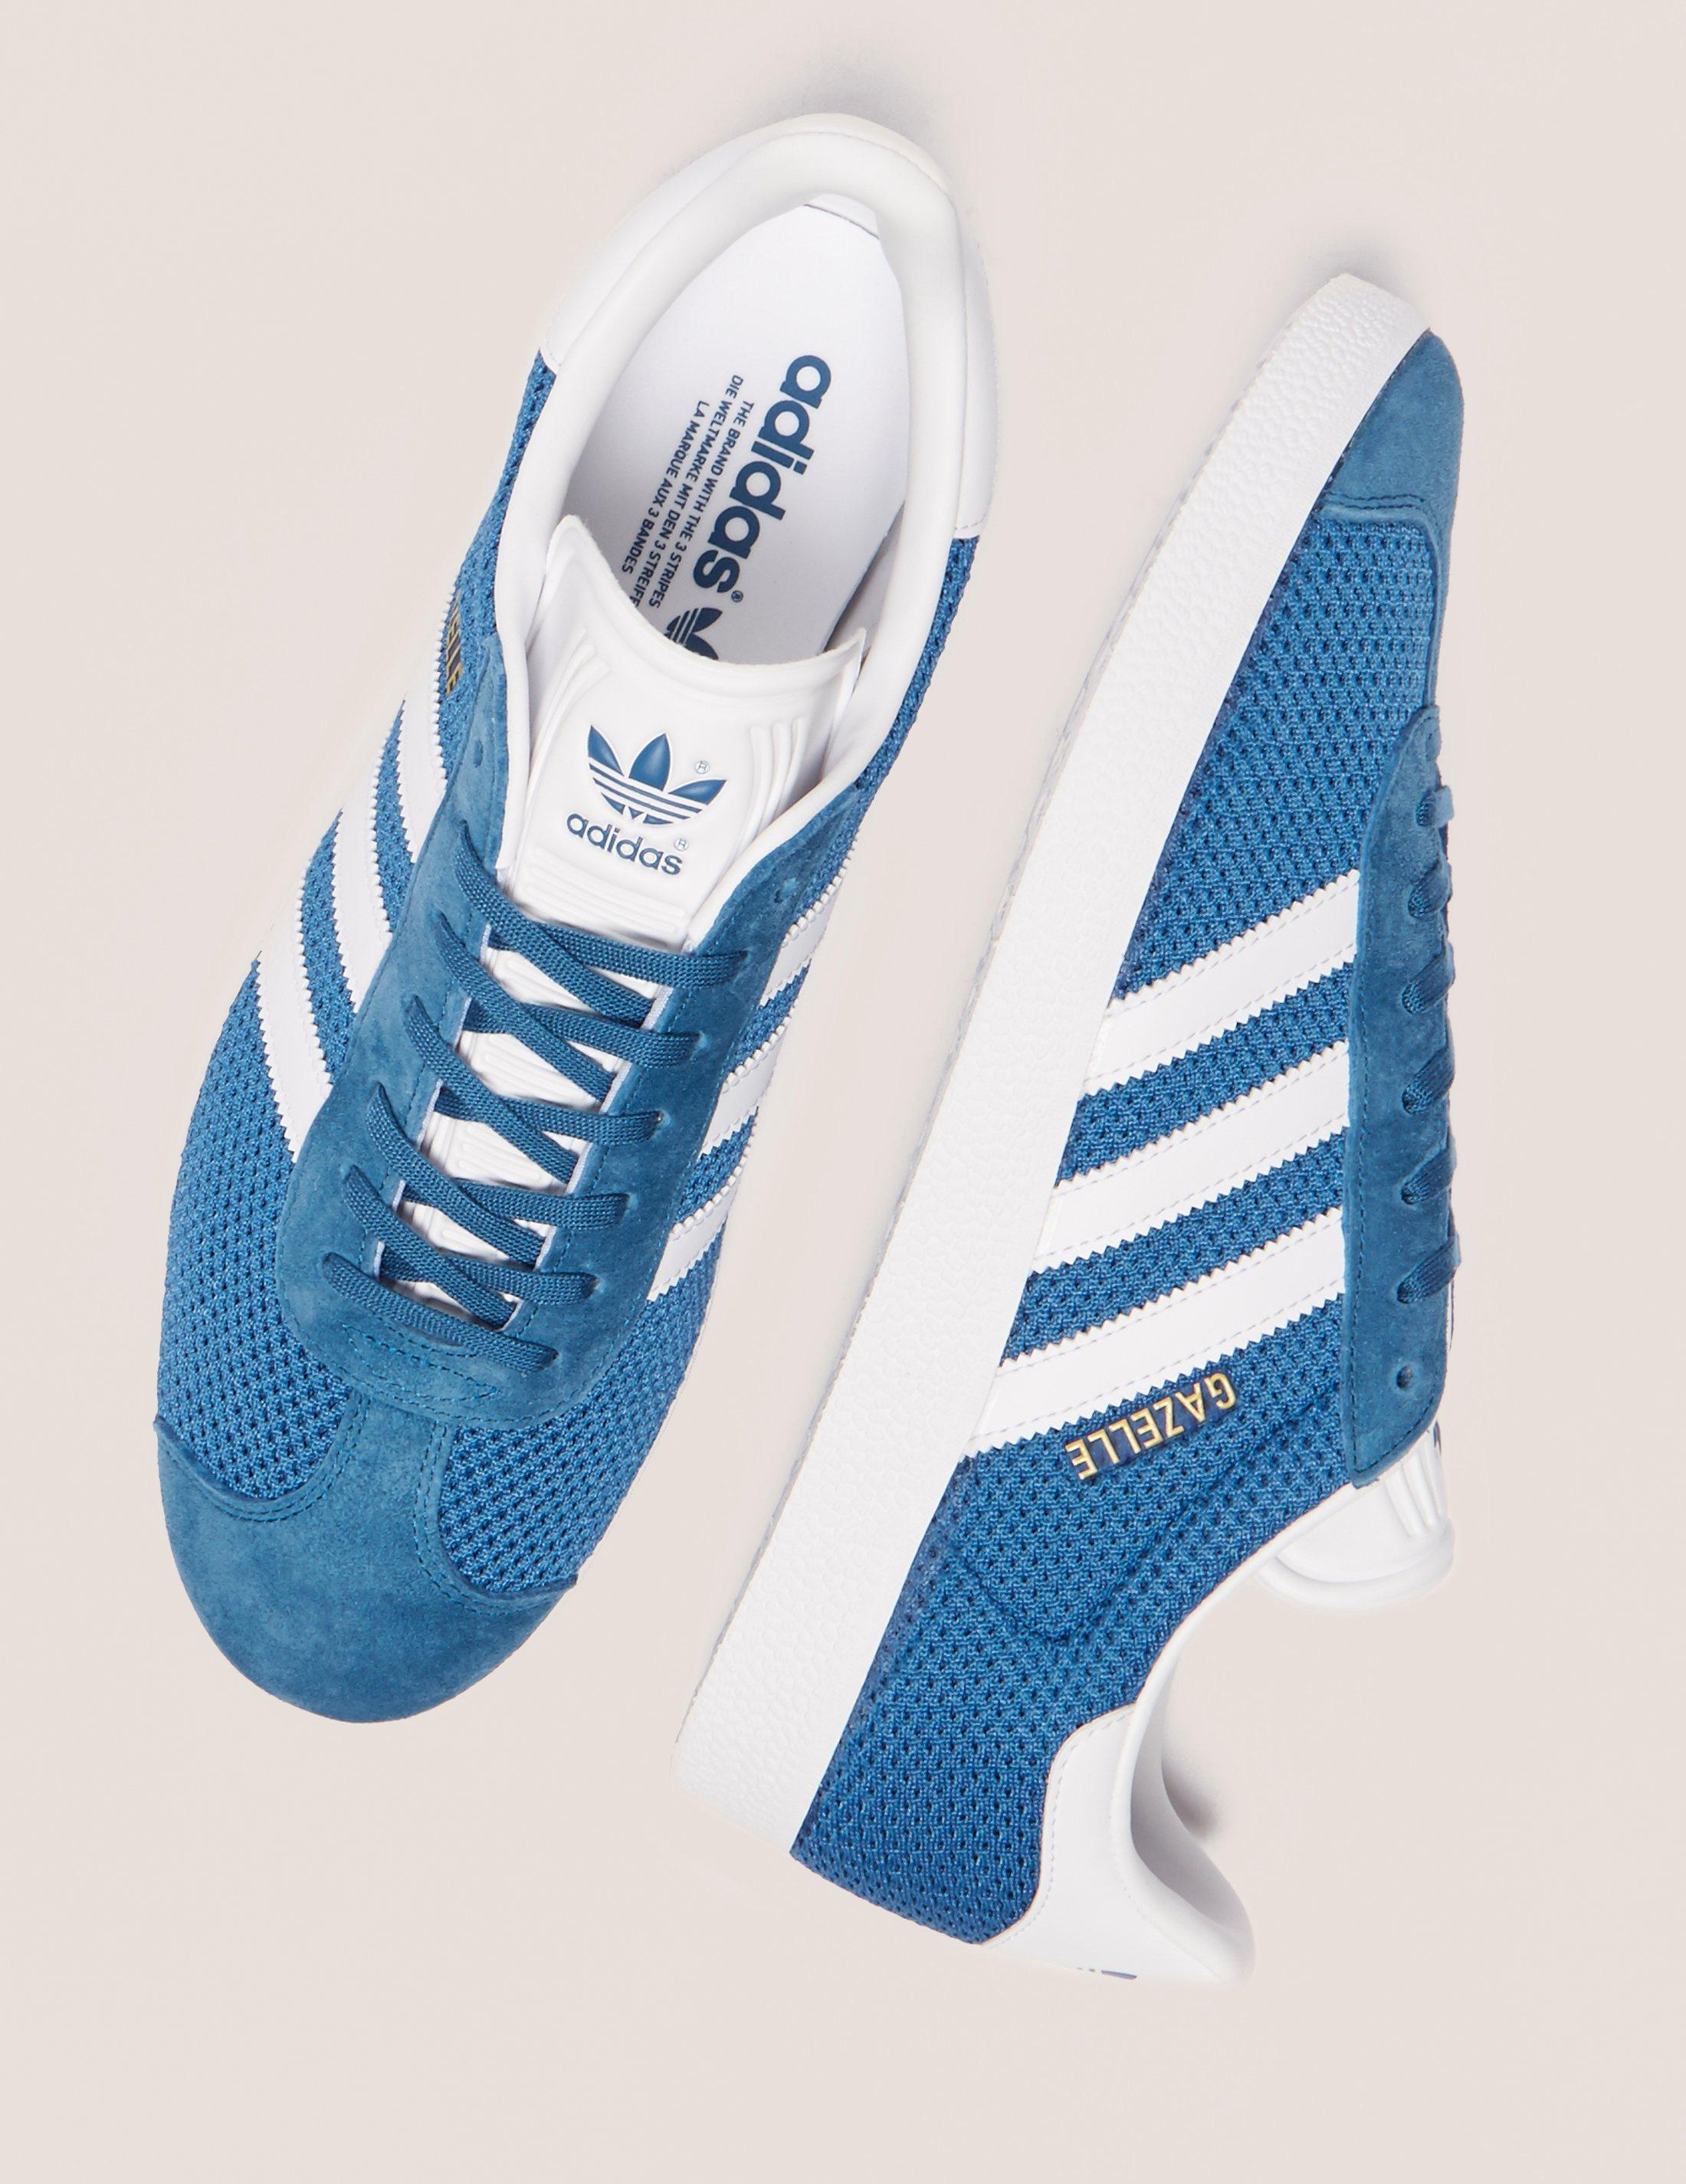 lyst adidas originali mens gazzella nucleo maglie blu, blu, blu